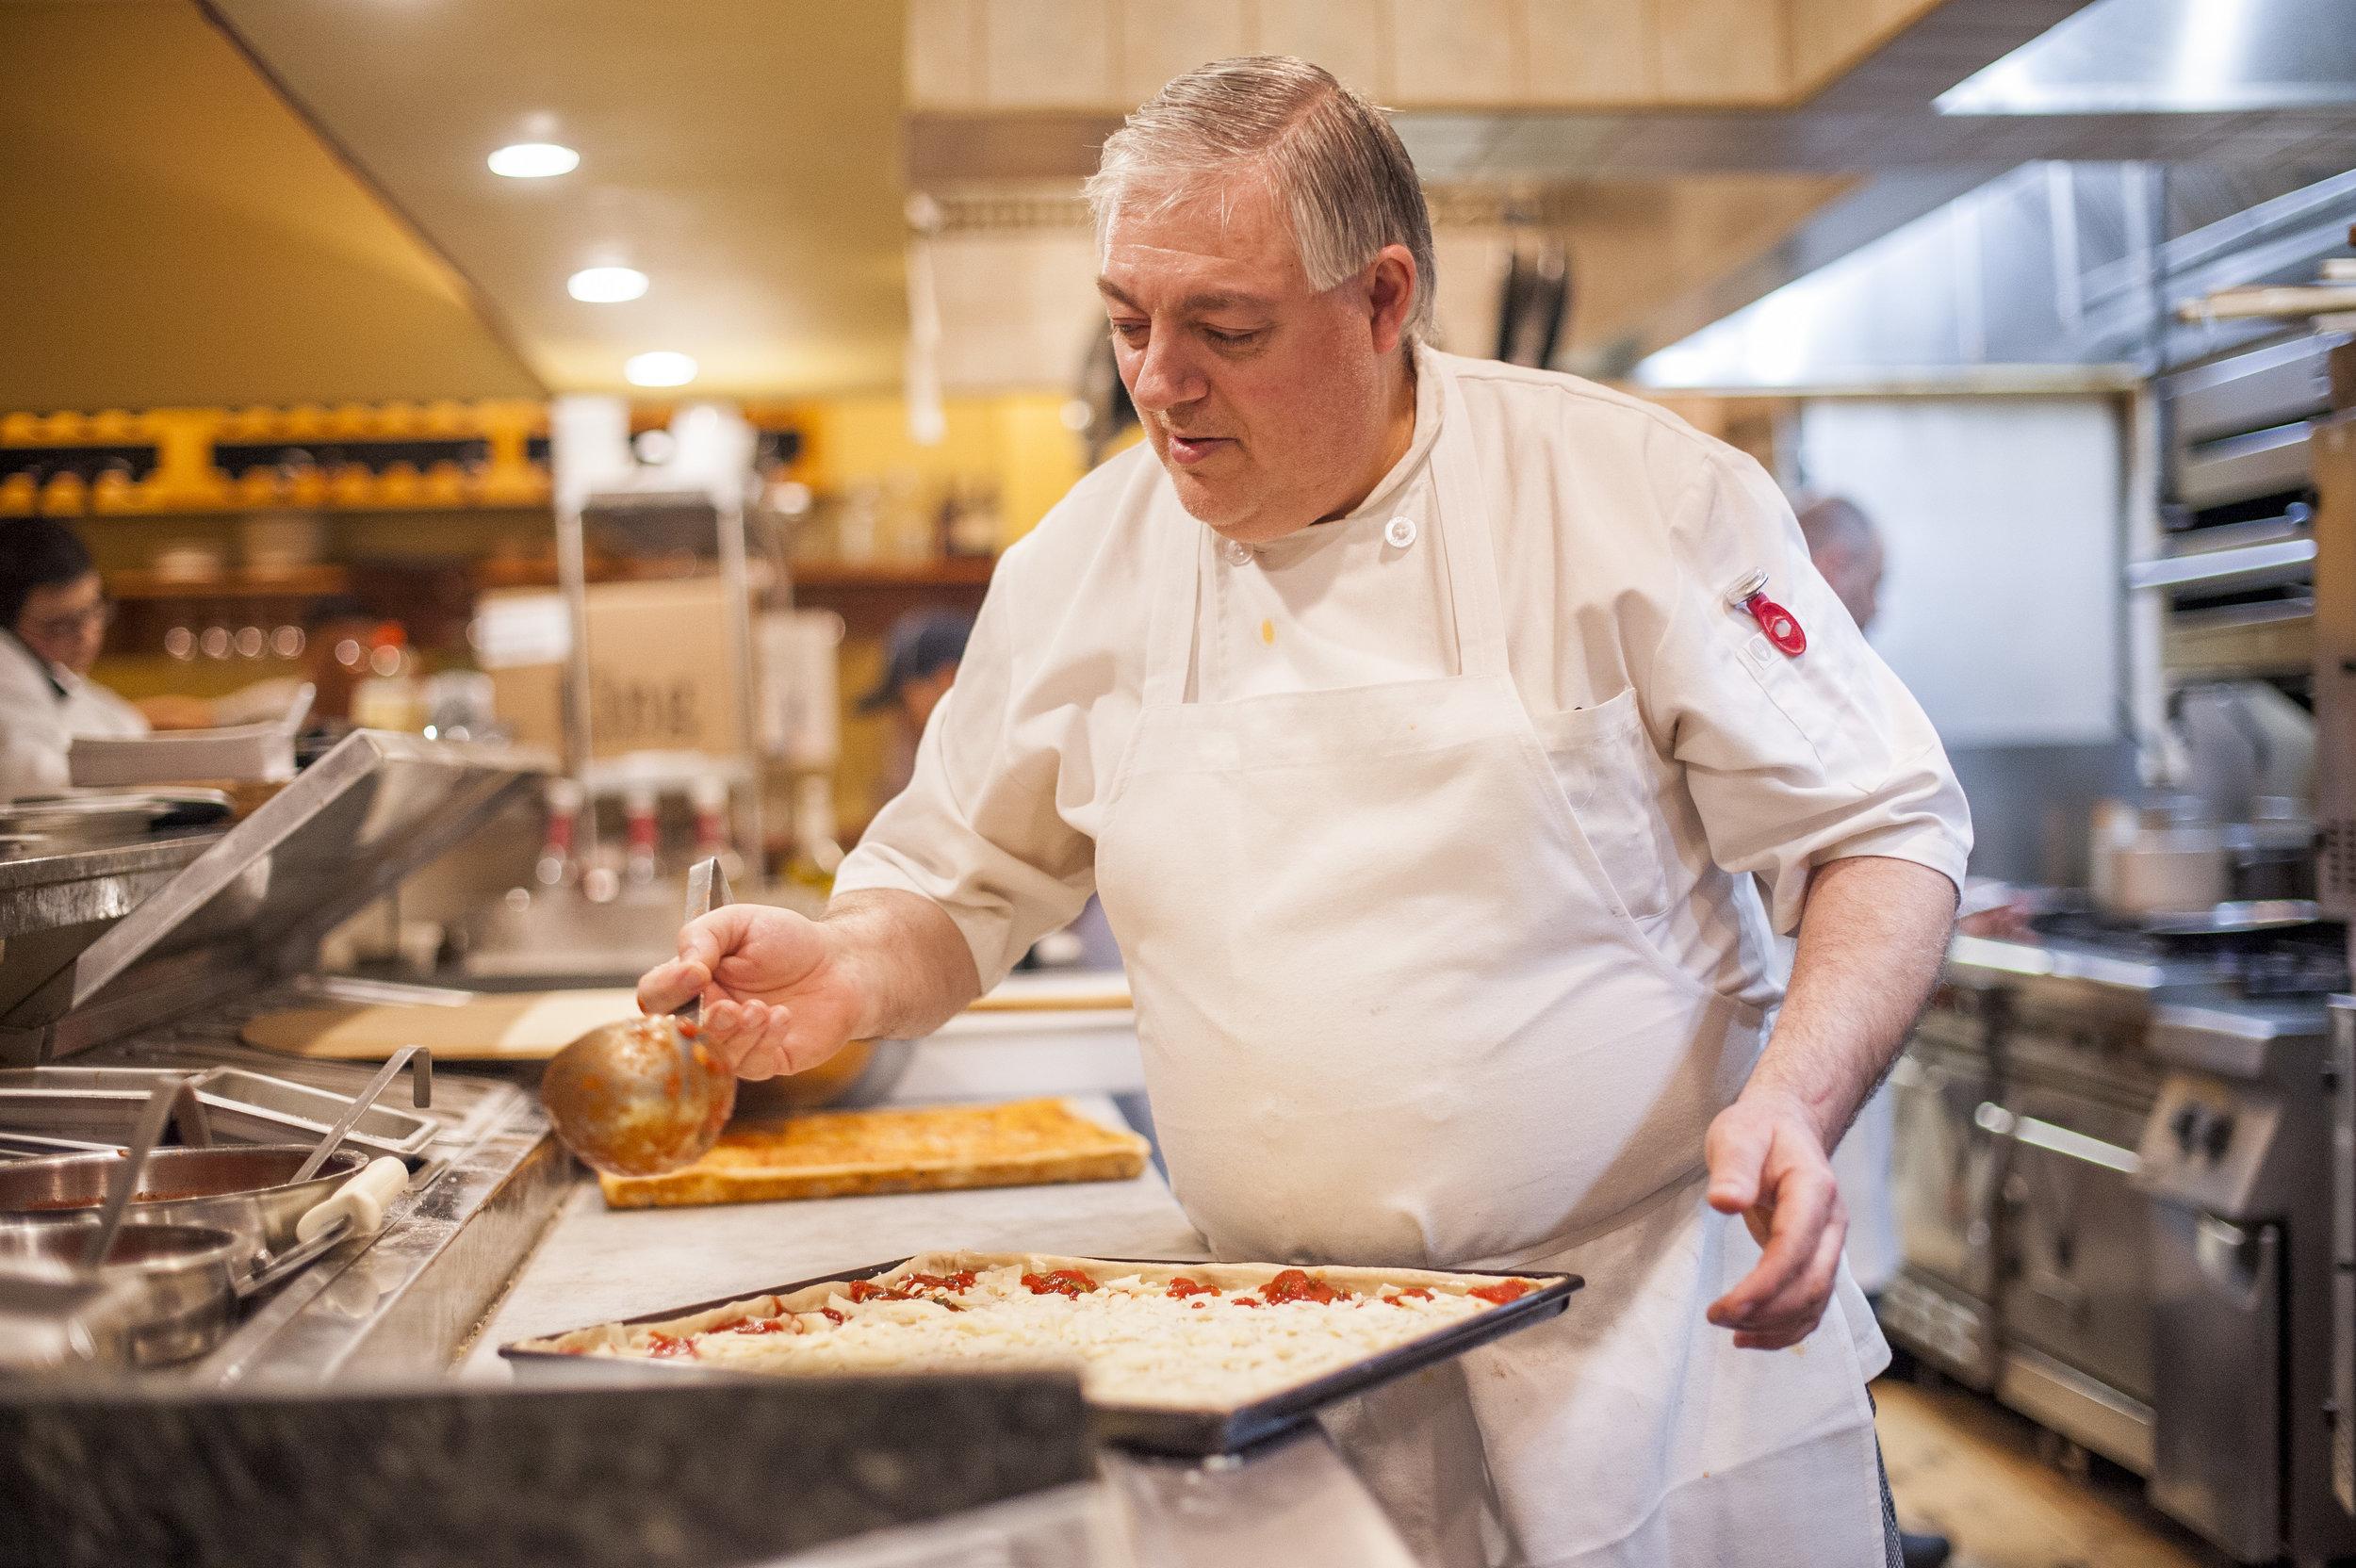 Vito DeFeo, owner of Viajo's Restaurant in Huntington, assembles a pizza.